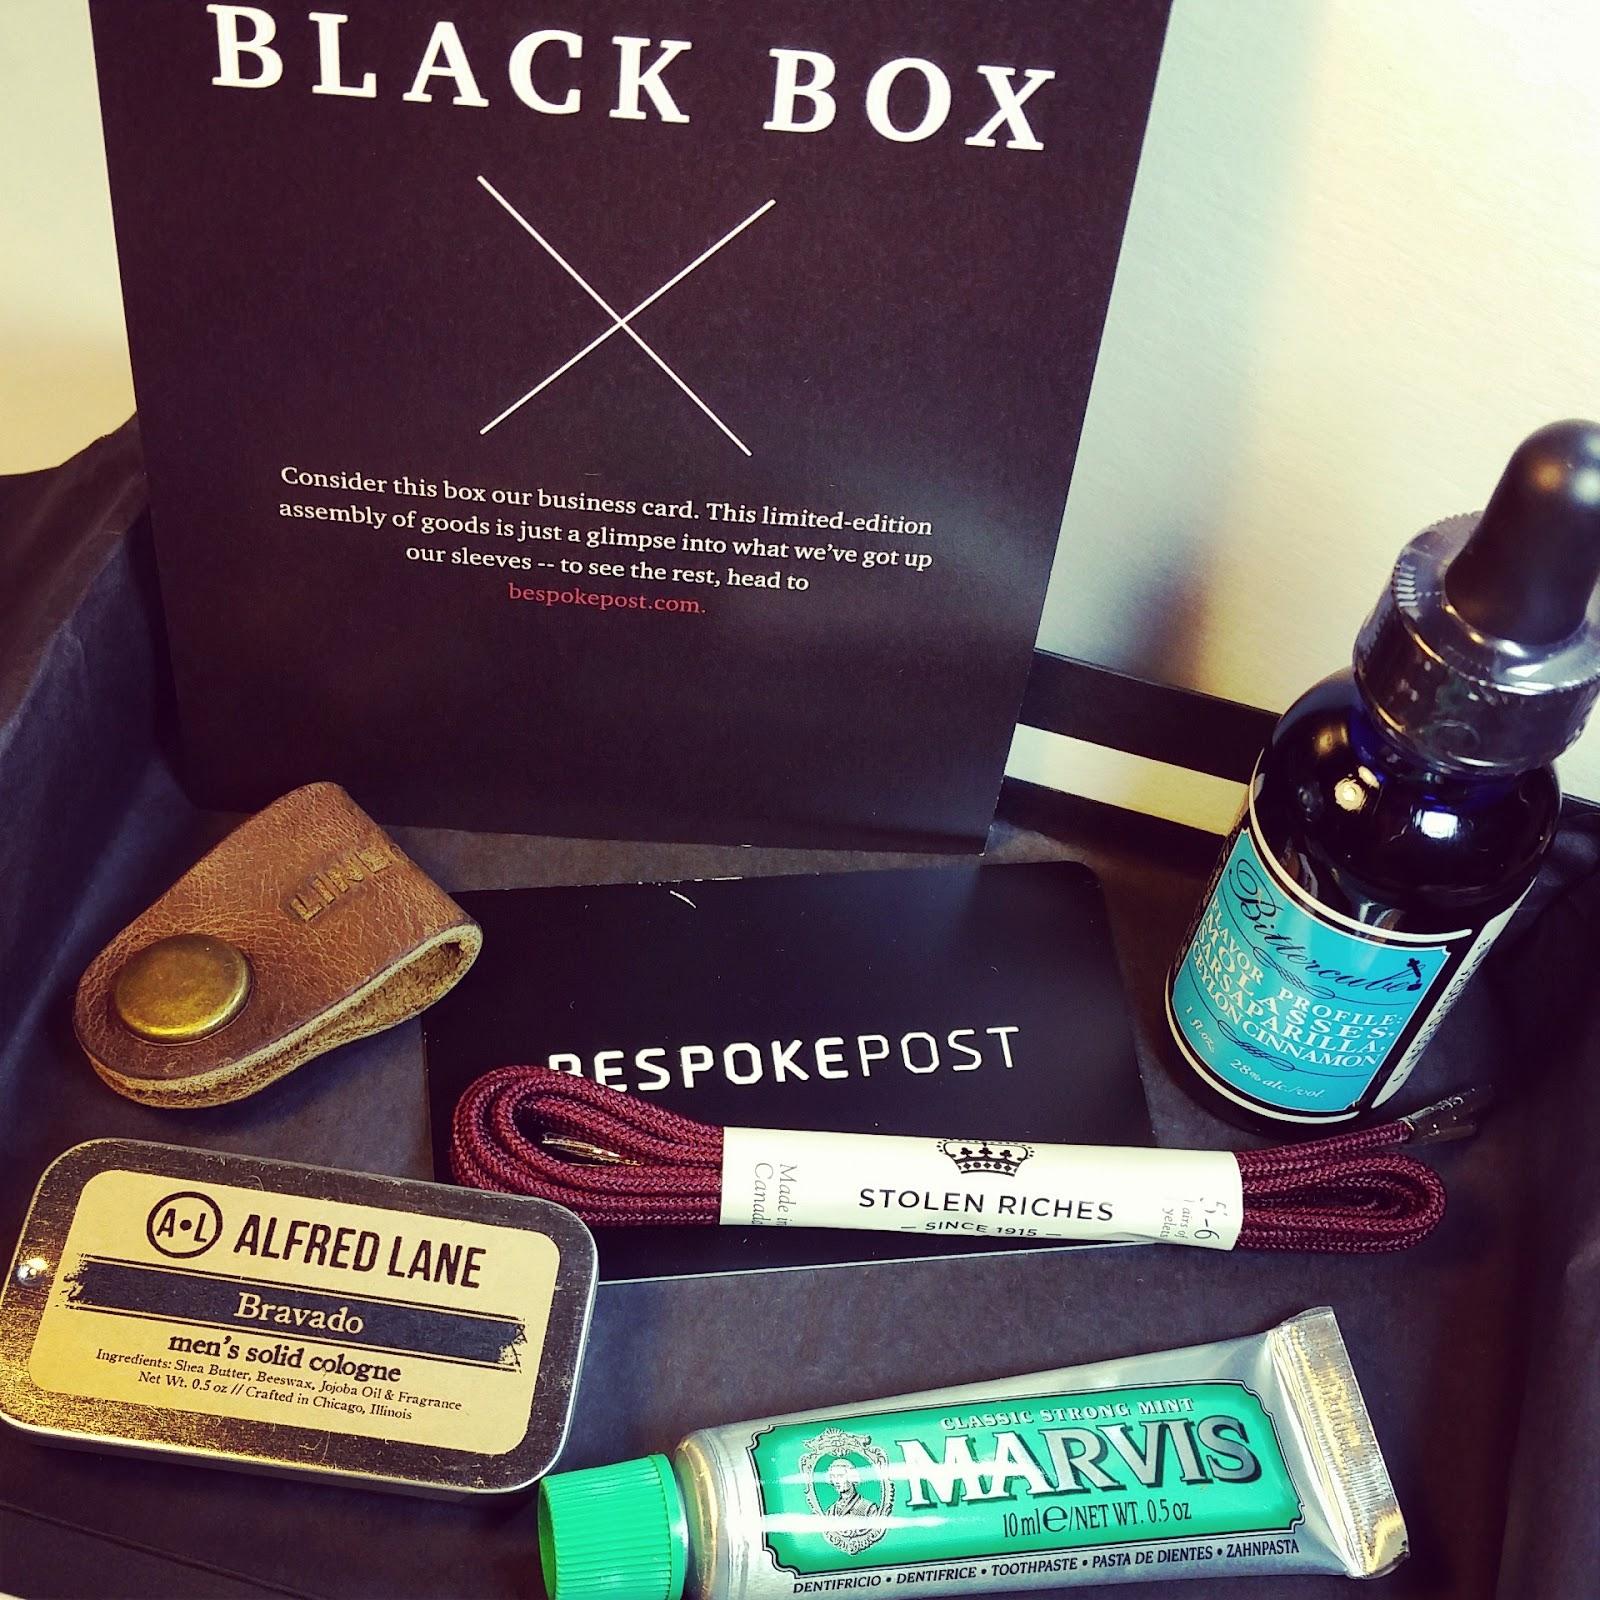 Bespoke Post Black Box Free Gift From Black Friday 2014